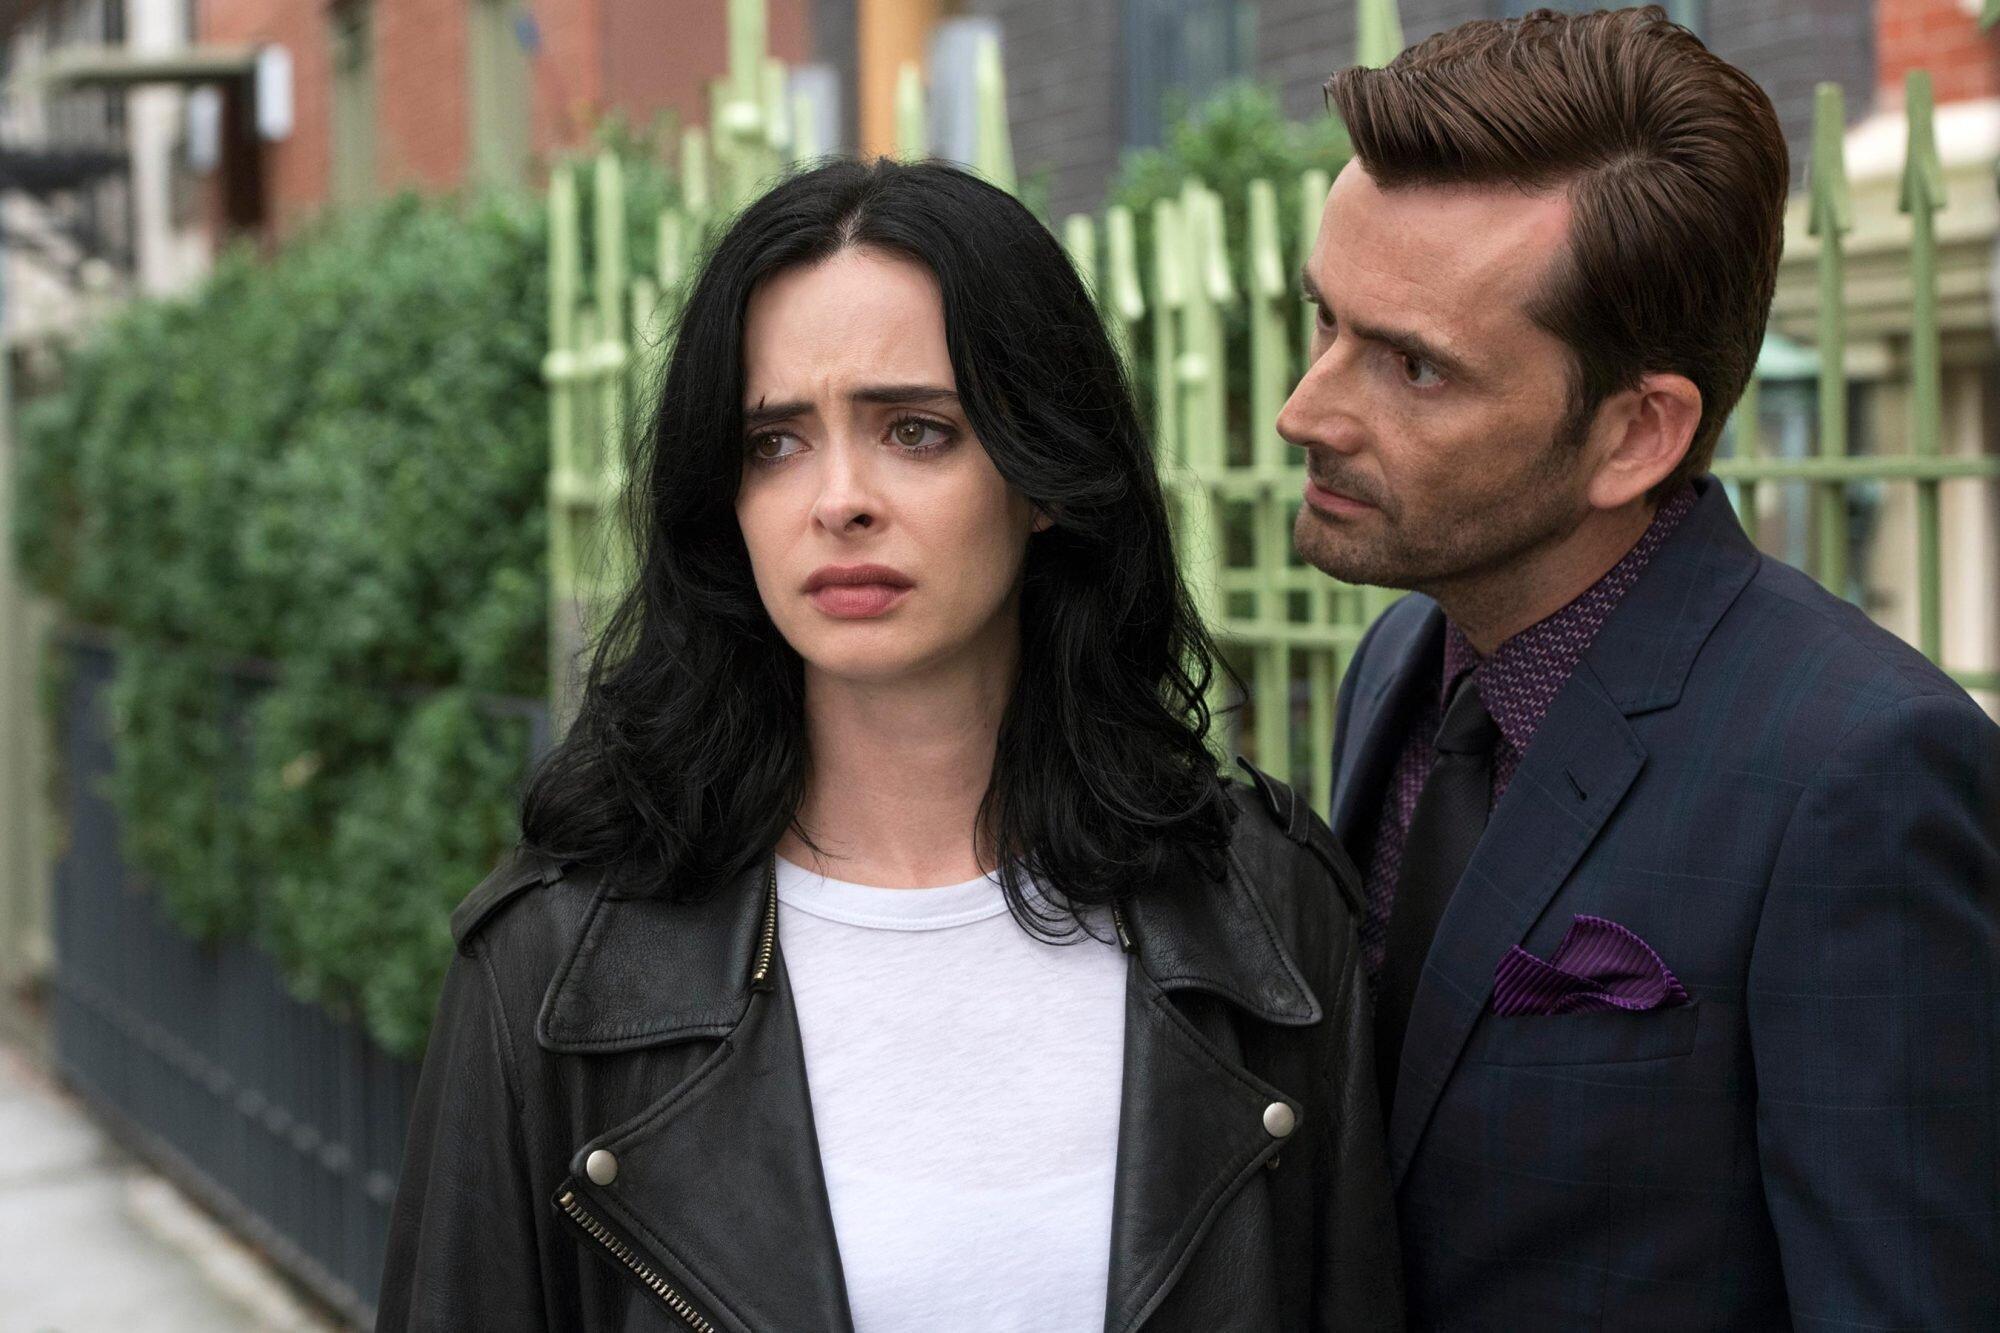 Jessica Jones And Kilgrave Halloween 2020 David Tennant won't be in 'Jessica Jones' season 3, reacts to